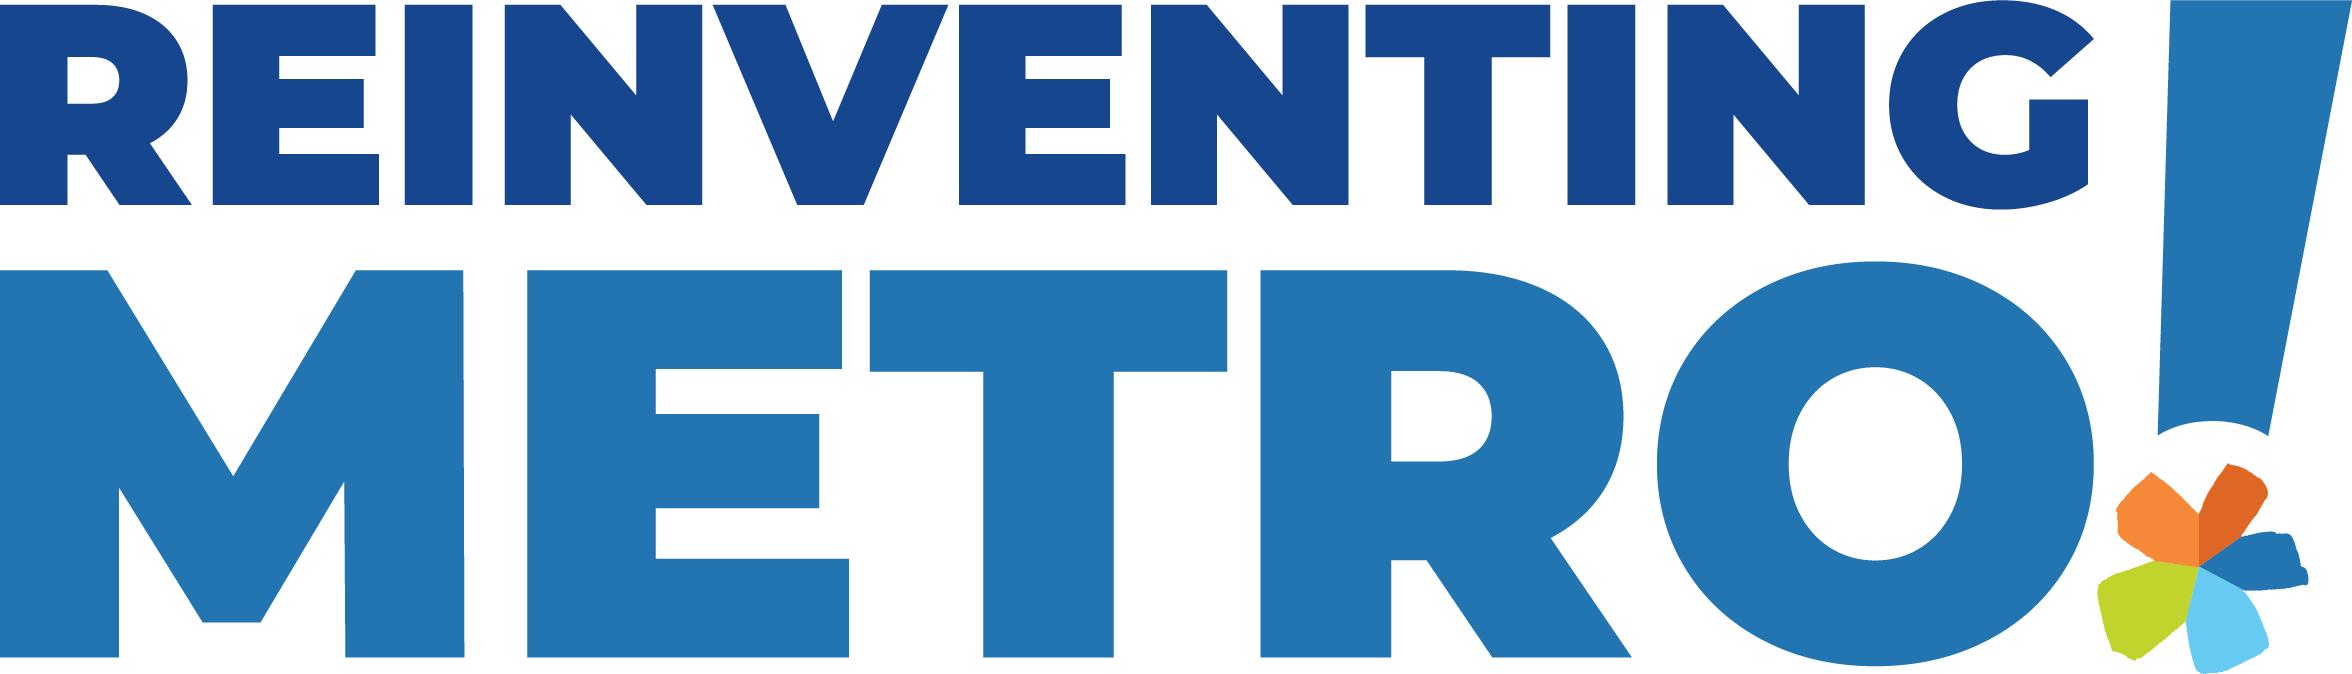 Reinventing-Metro-Logo_RGB_for-web.png